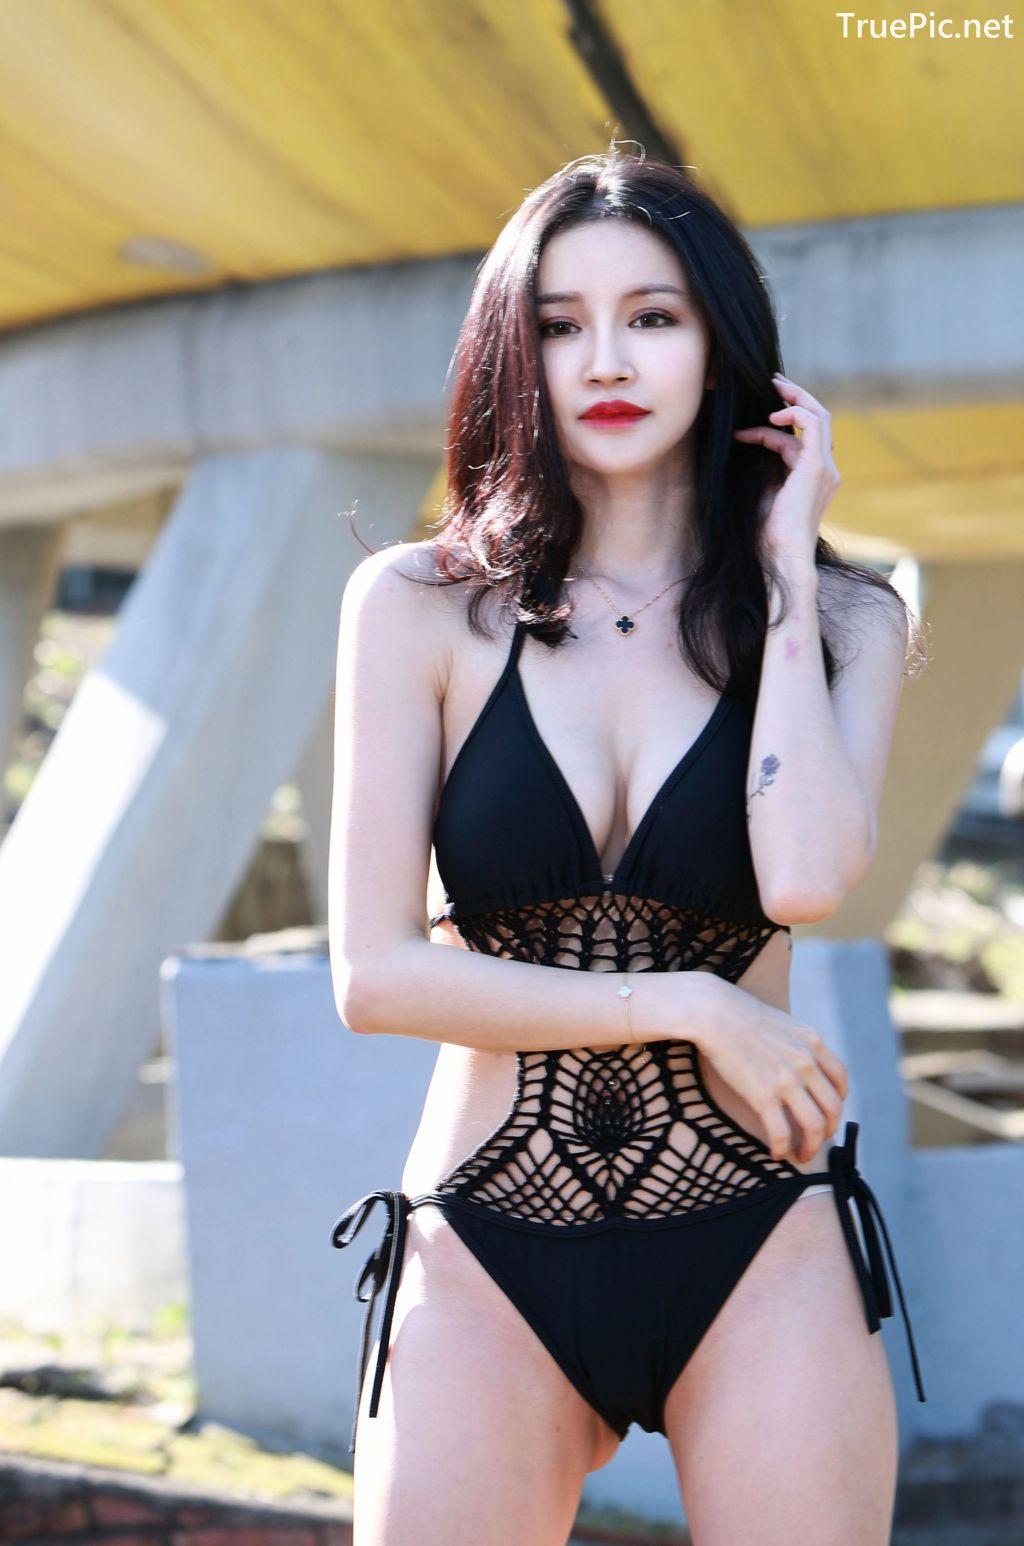 Image-Taiwanese-Model-艾薉-Long-Legs-And-Lovely-Bikini-Girl-TruePic.net- Picture-7